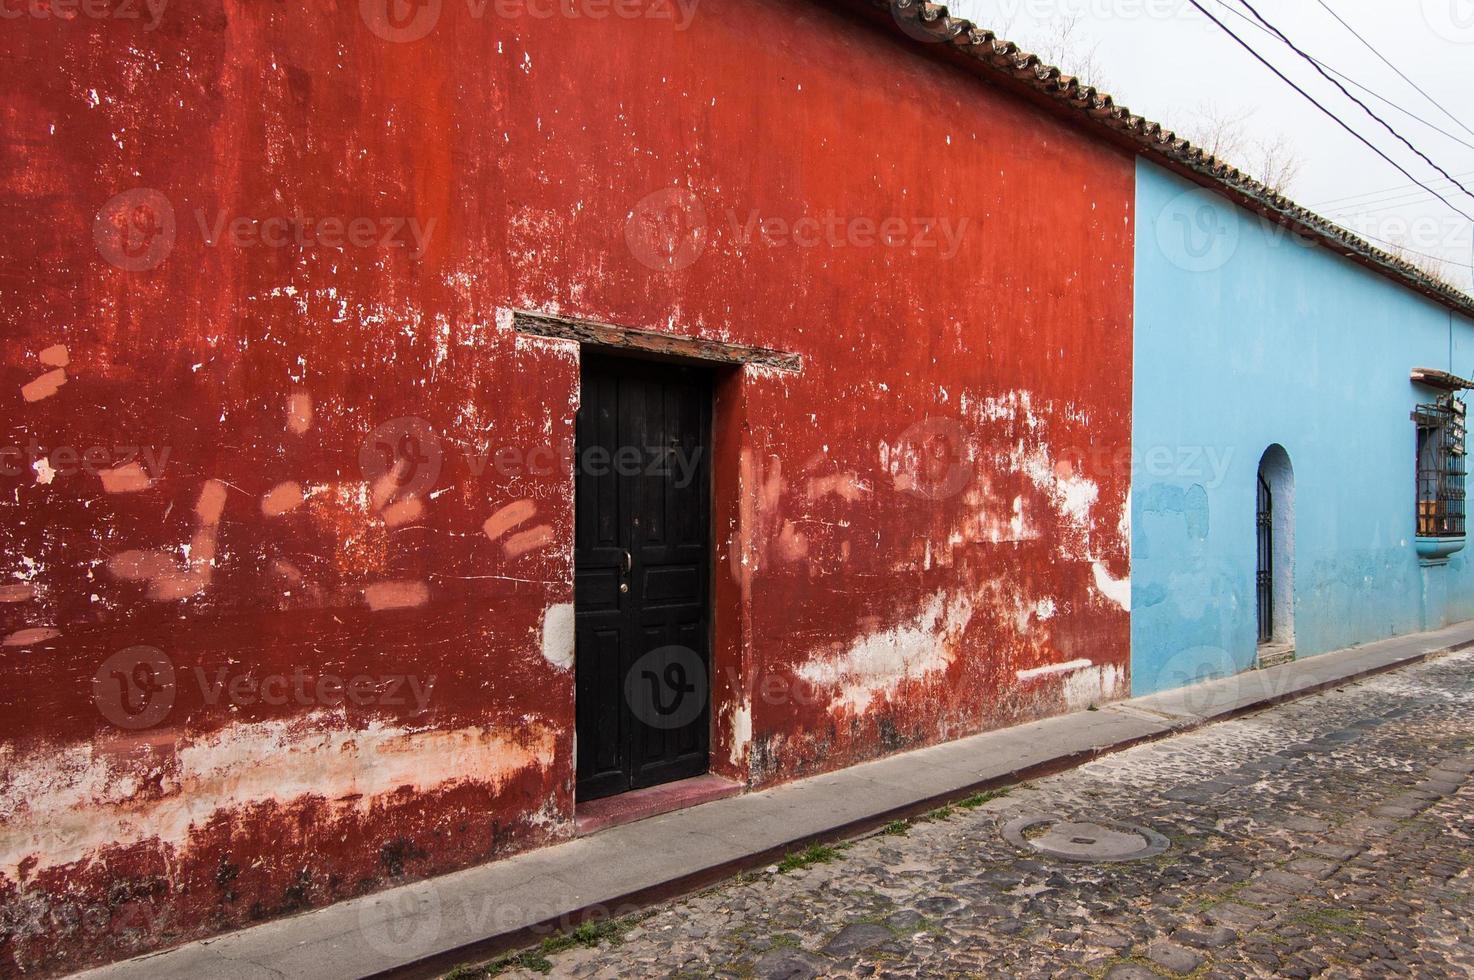 färgglada målade hus i Antigua, Guatemala foto